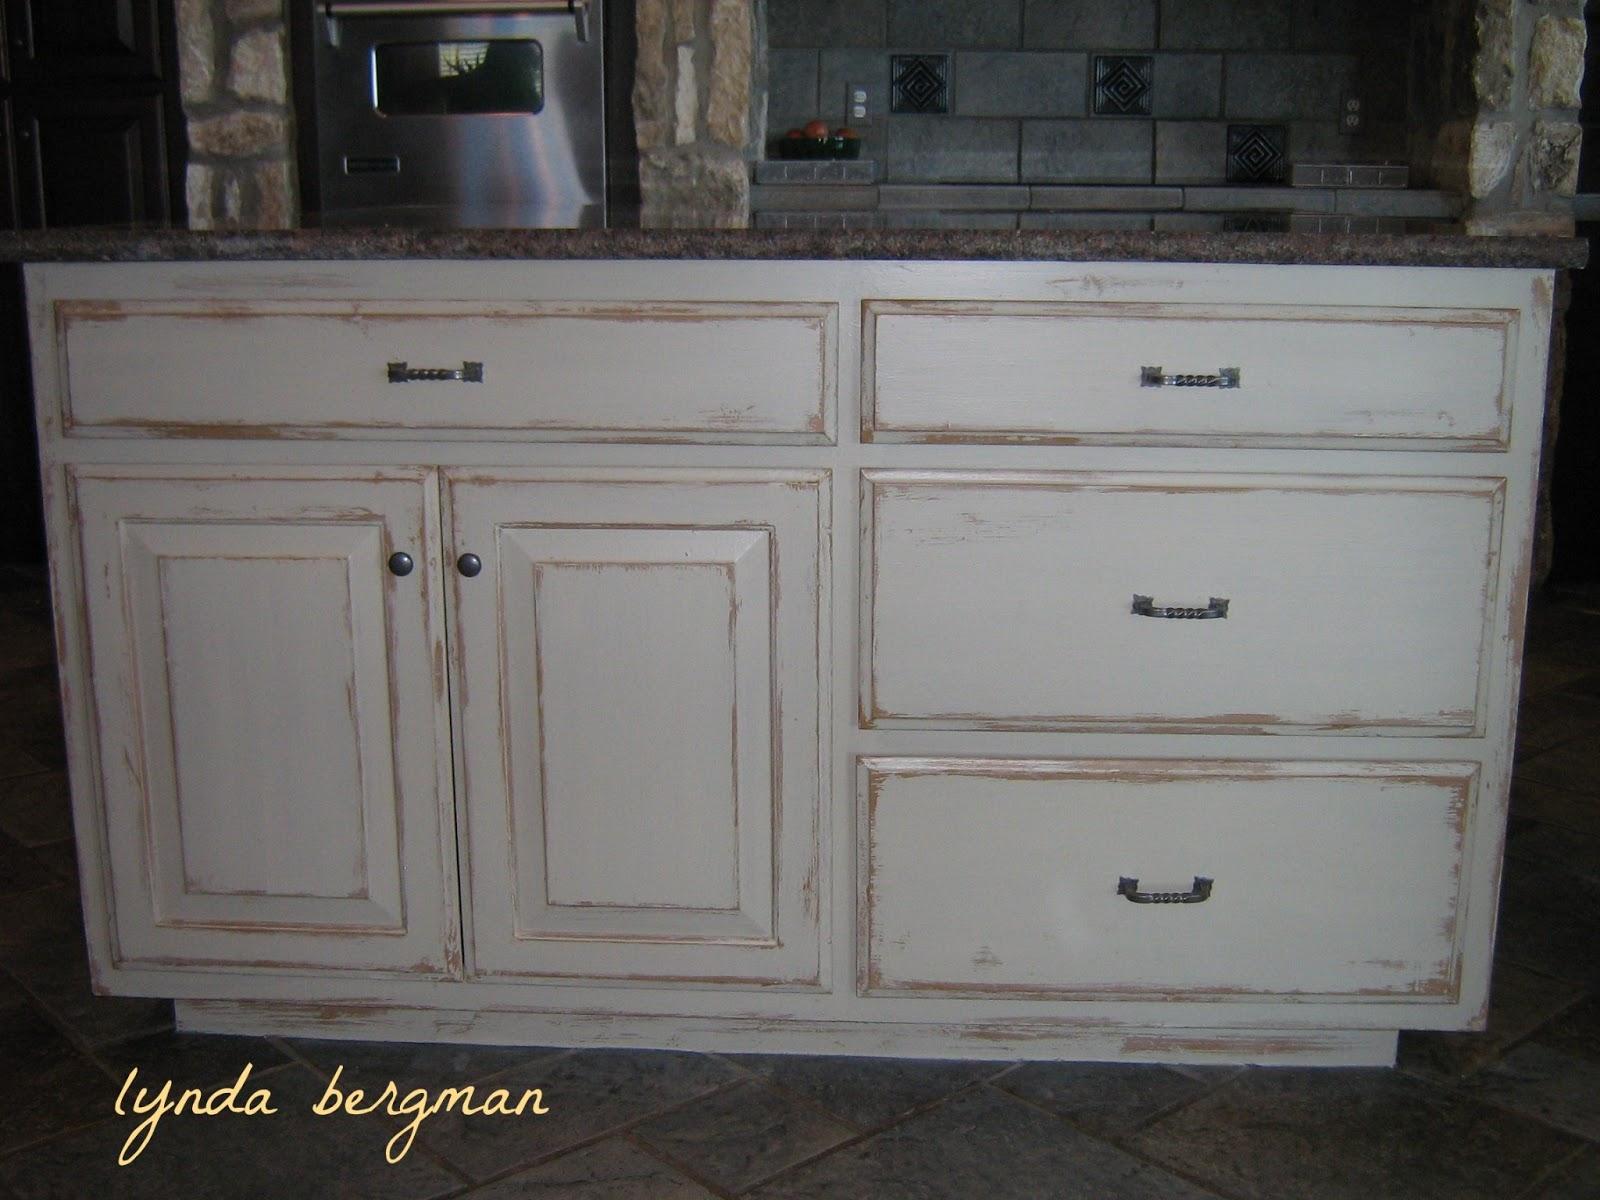 distressed wood kitchen cabinets tv mount lynda bergman decorative artisan white